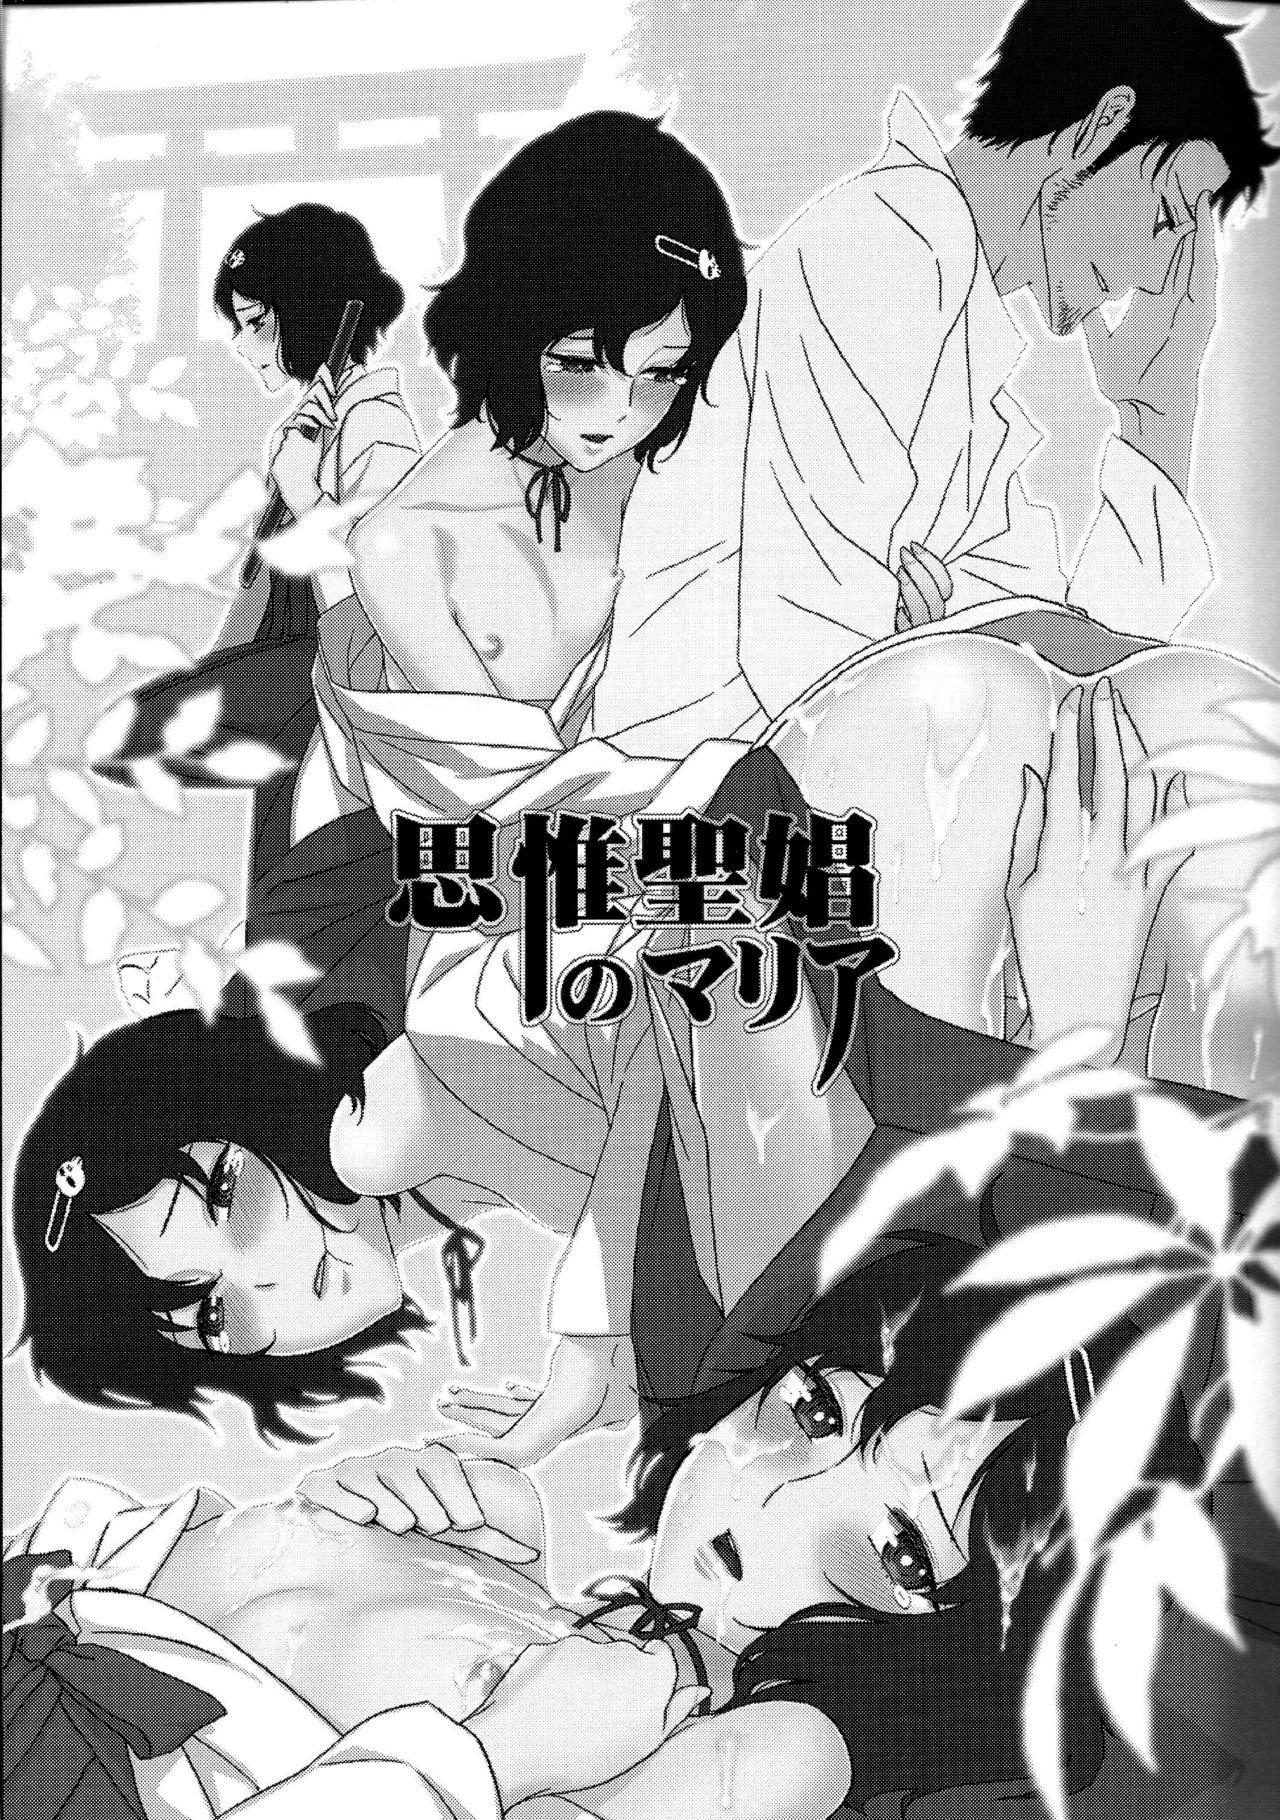 Shiiseishou no Maria | Maria the Thoughtful Saint 2